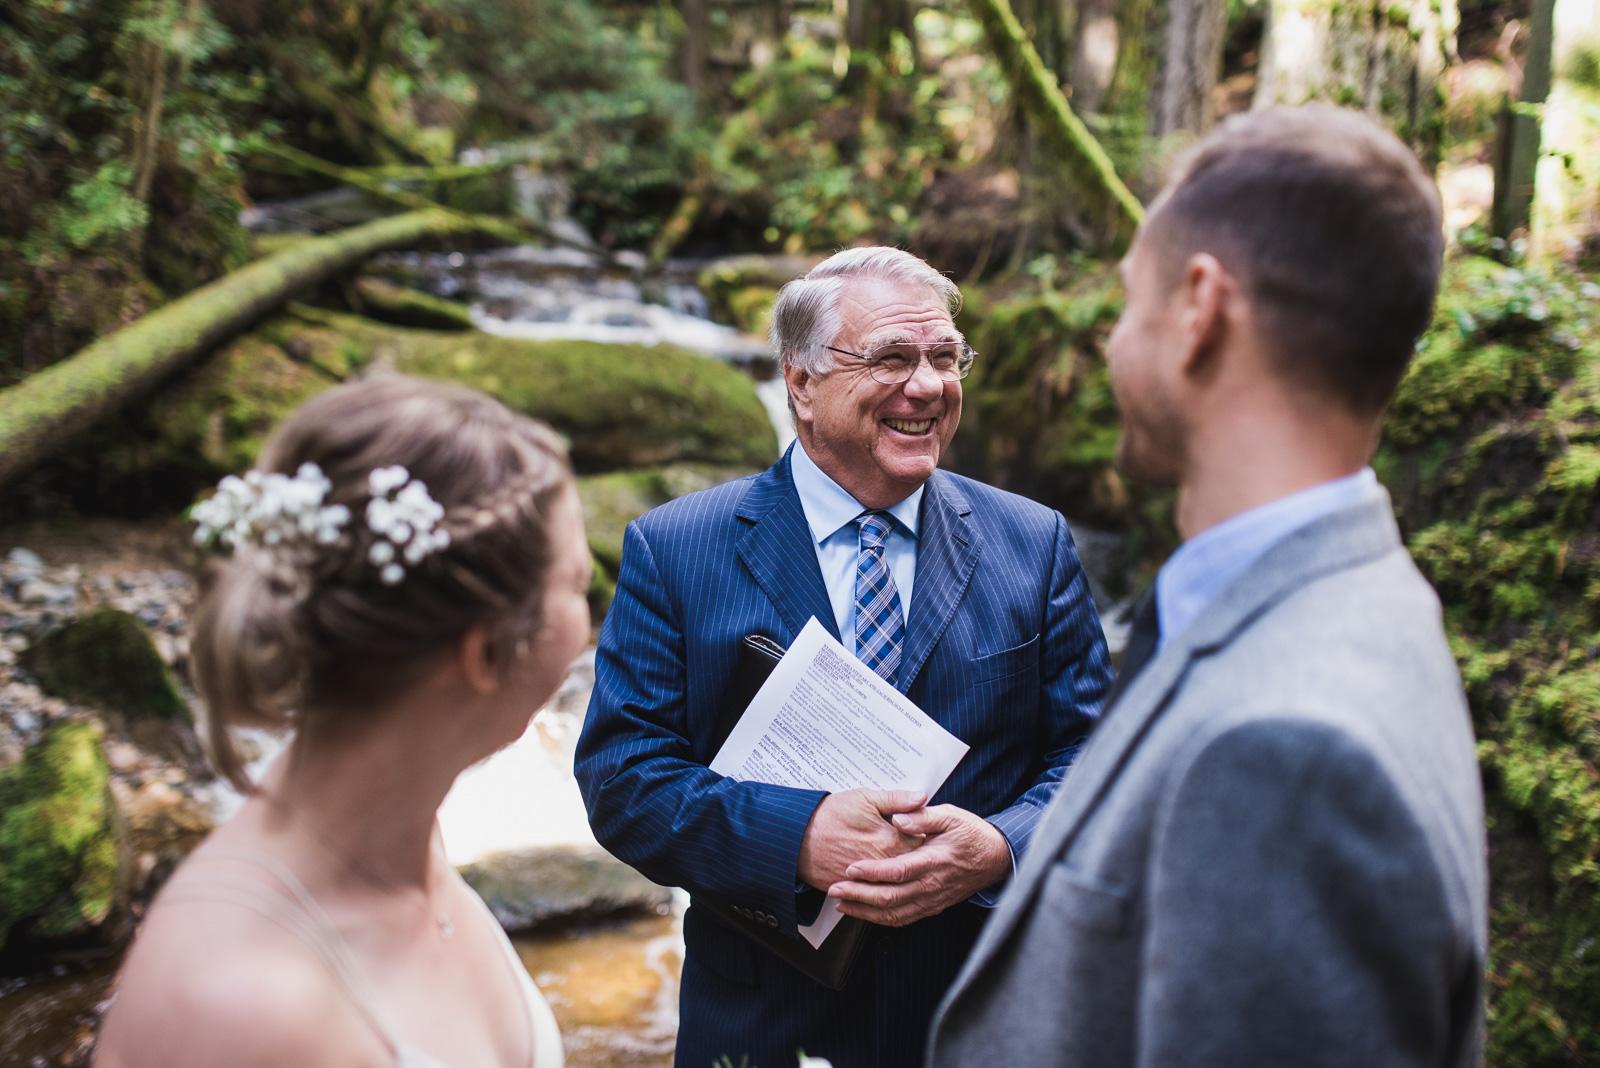 vancouver-island-wedding-photographers-cliff-gilker-park-smugglers-cove-elopement-5.jpg